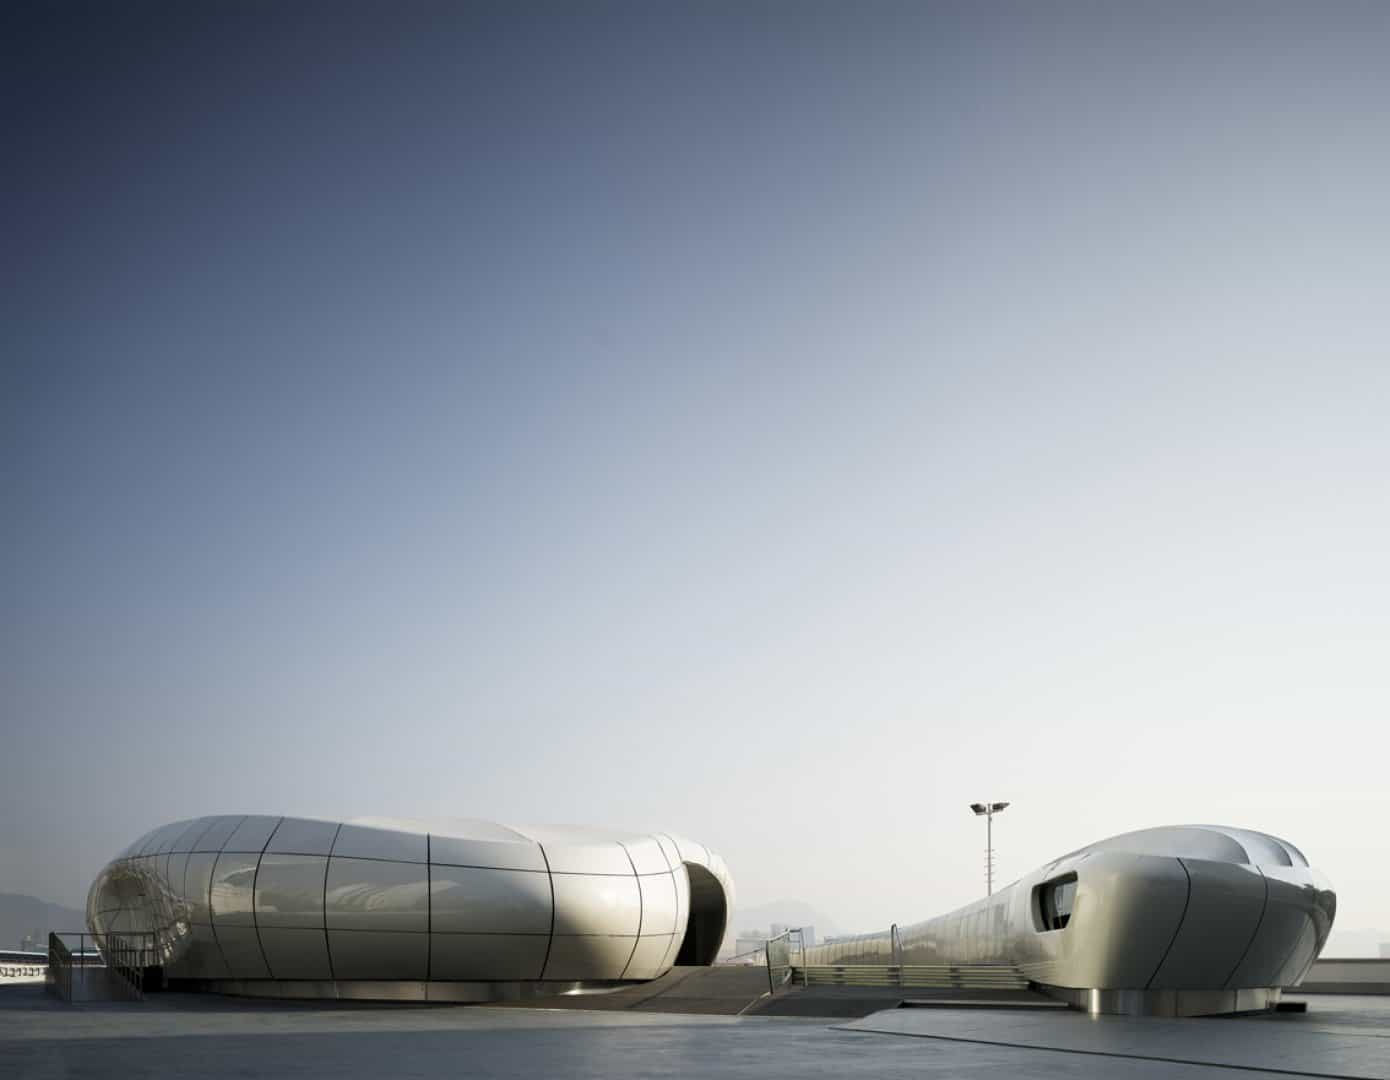 Zaha Hadid Design - Mobile Art Chanel Pavilion - virgilesimonbertrand_hongkong2